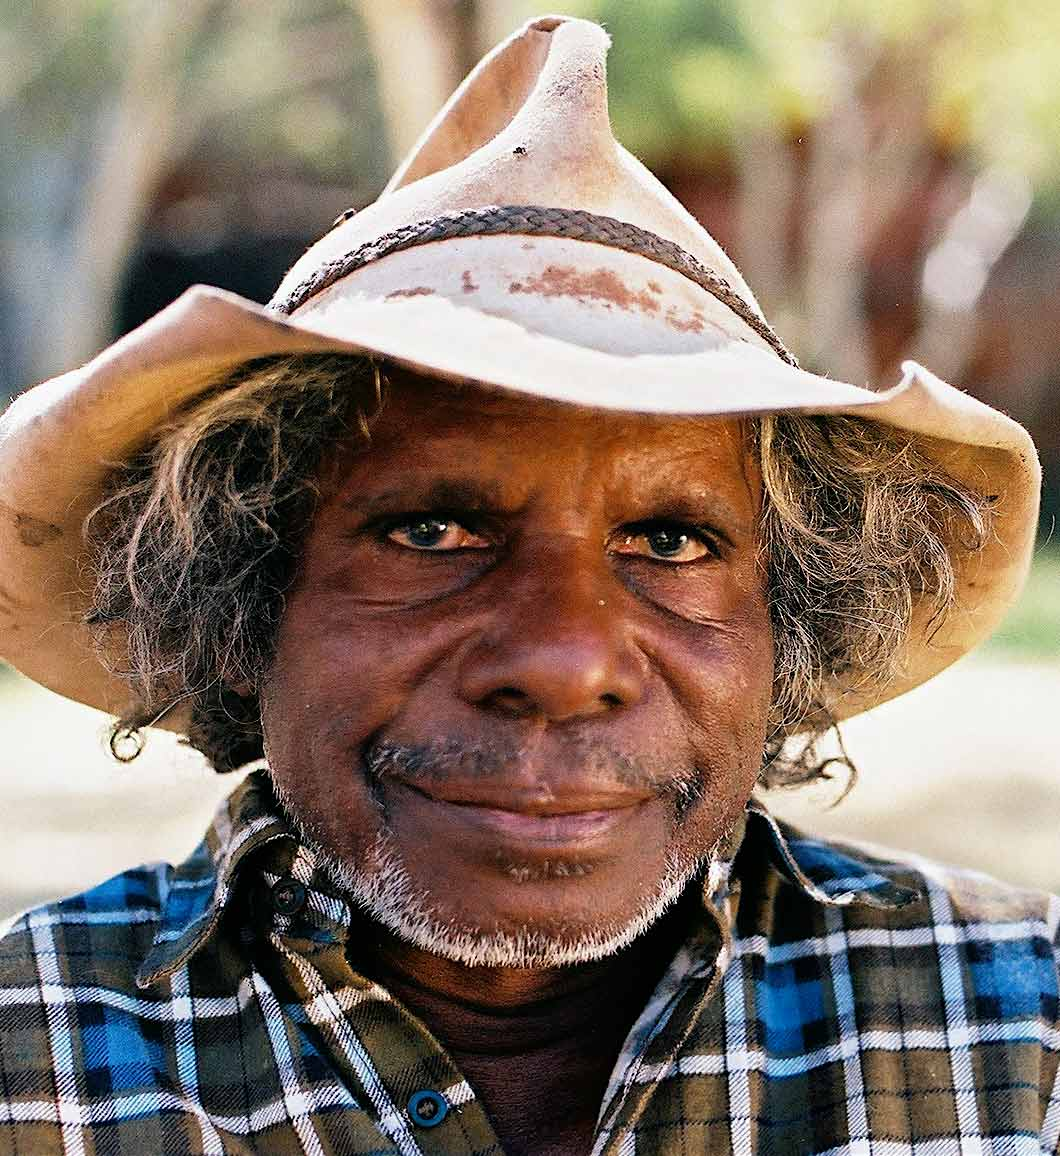 Portrait of Jawurji Mervyn Street. - click to view larger image